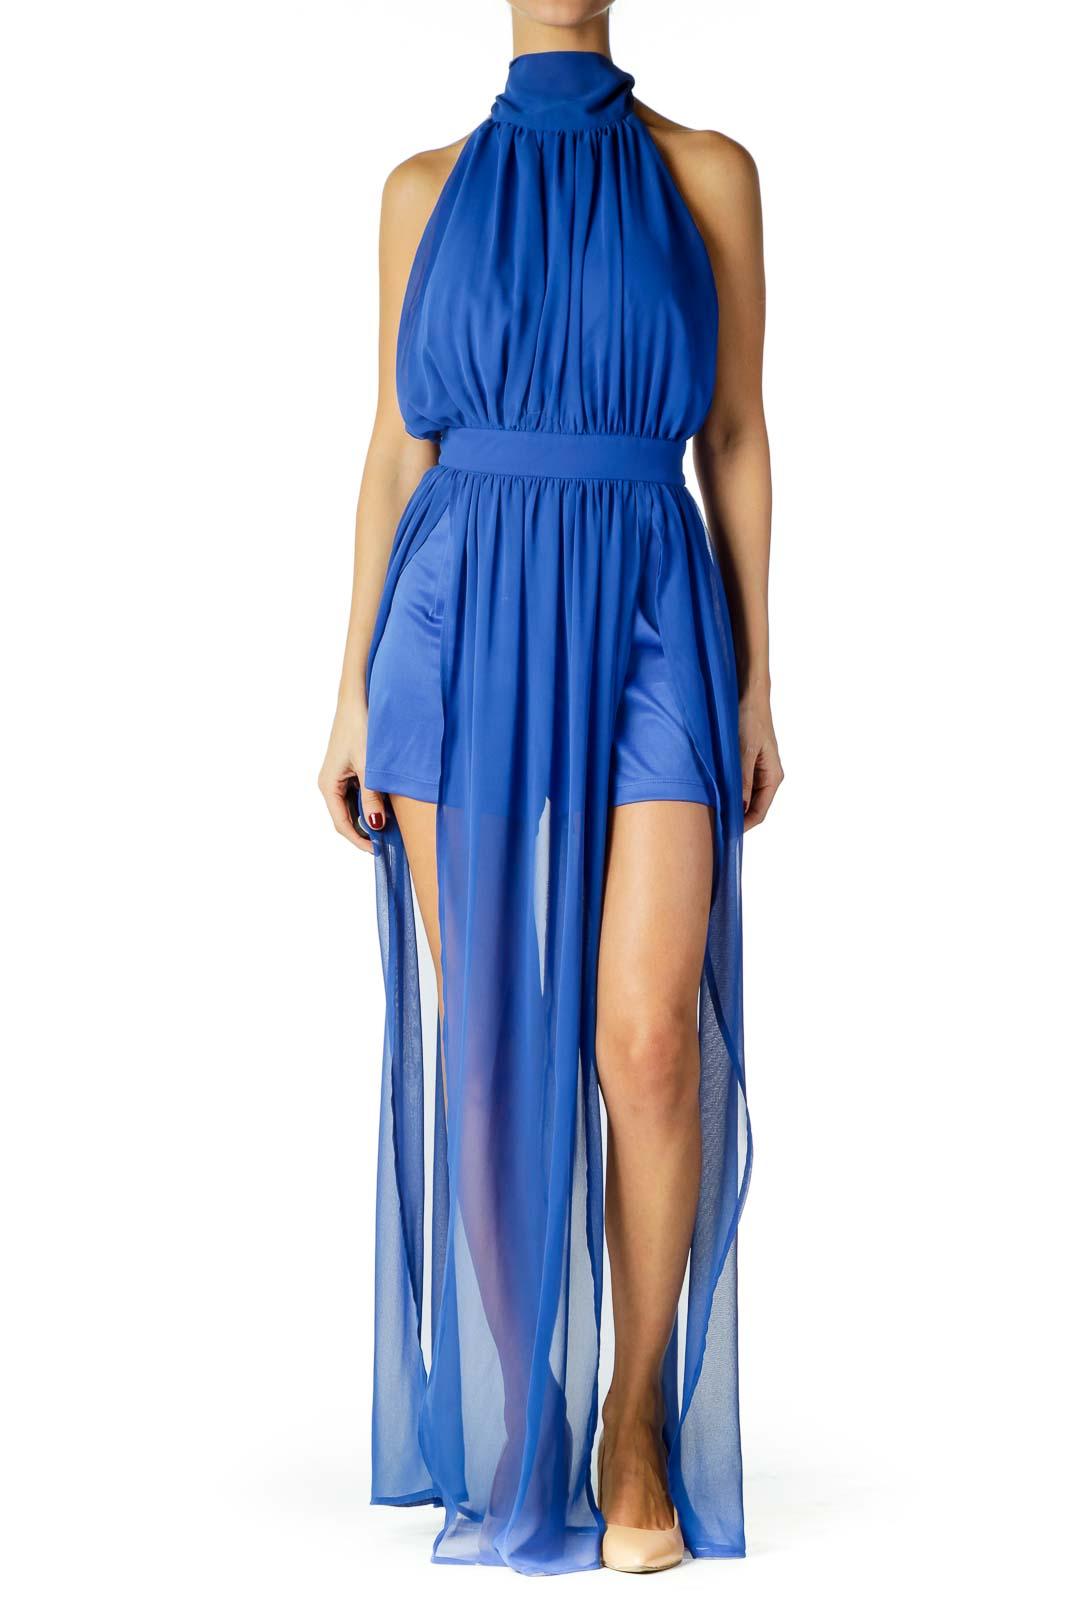 Blue Halter Sheer Dress